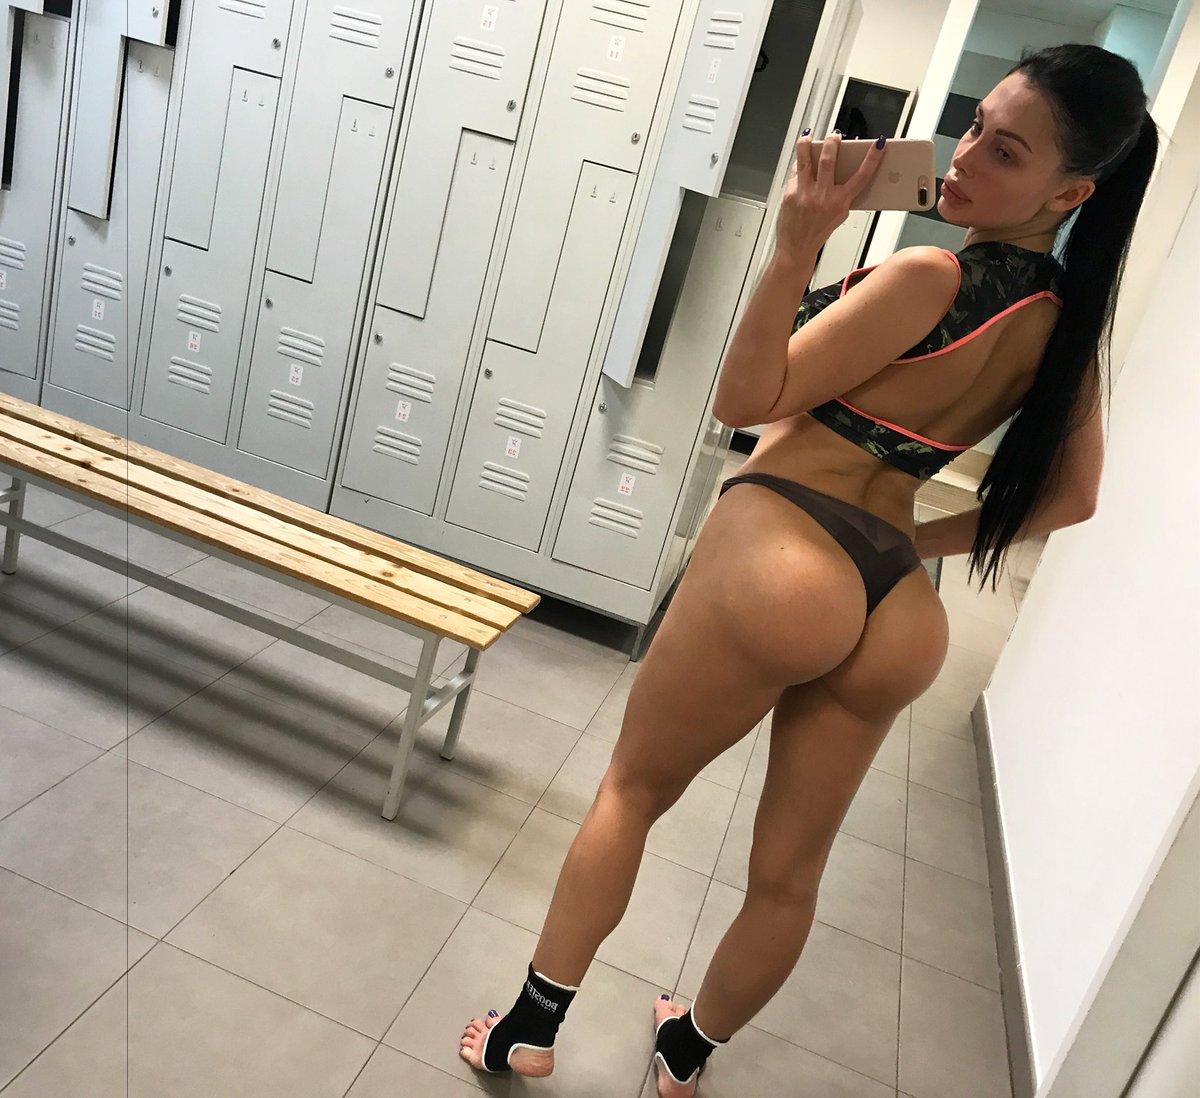 Aletta Ocean-pornstar  - Just finishe twitter @ALETTAOCEANXXXX